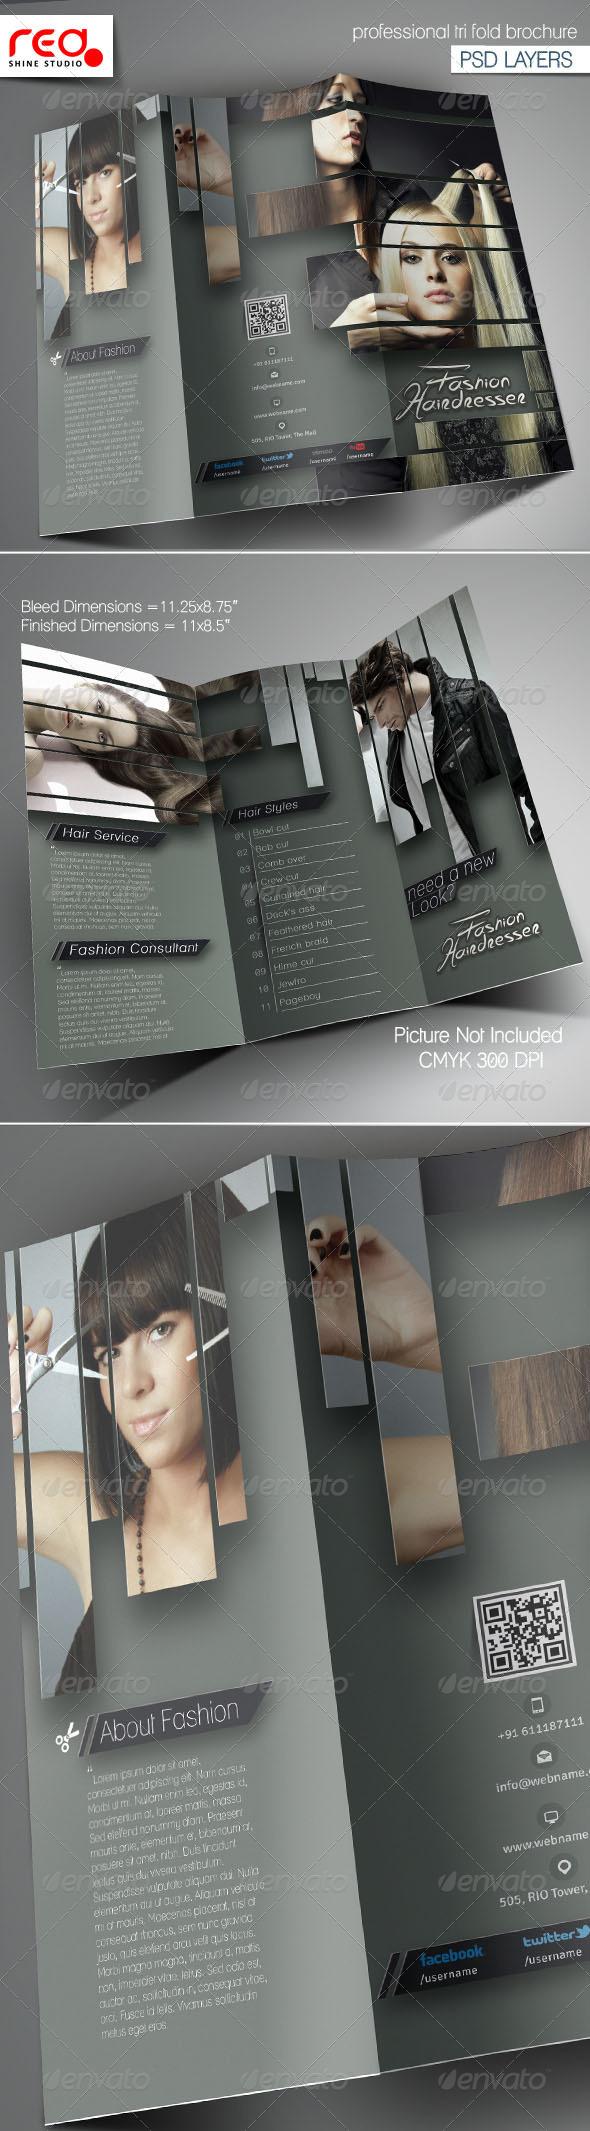 Hairdresser Salon Trifold Brochure Template - Brochures Print Templates